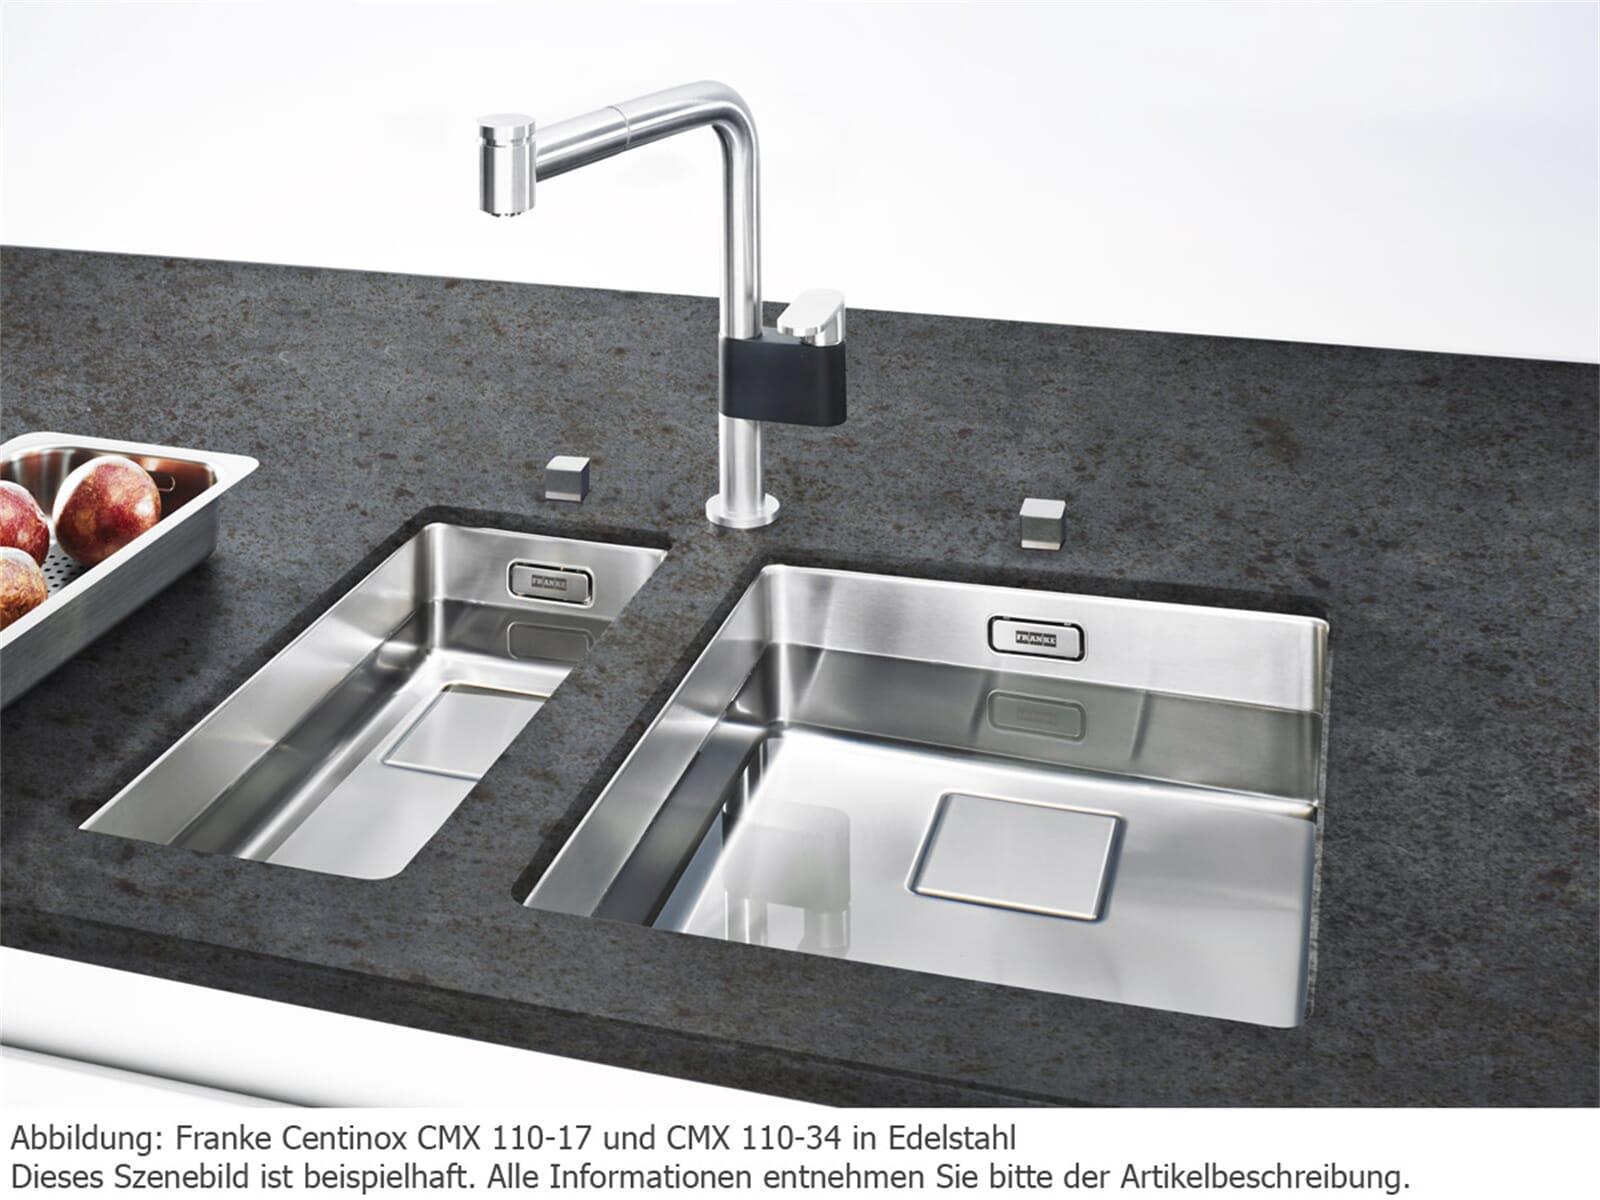 Sehr Franke Centinox CMX 110-34 Edelstahlspüle glatt - 122.0281.708 MW02